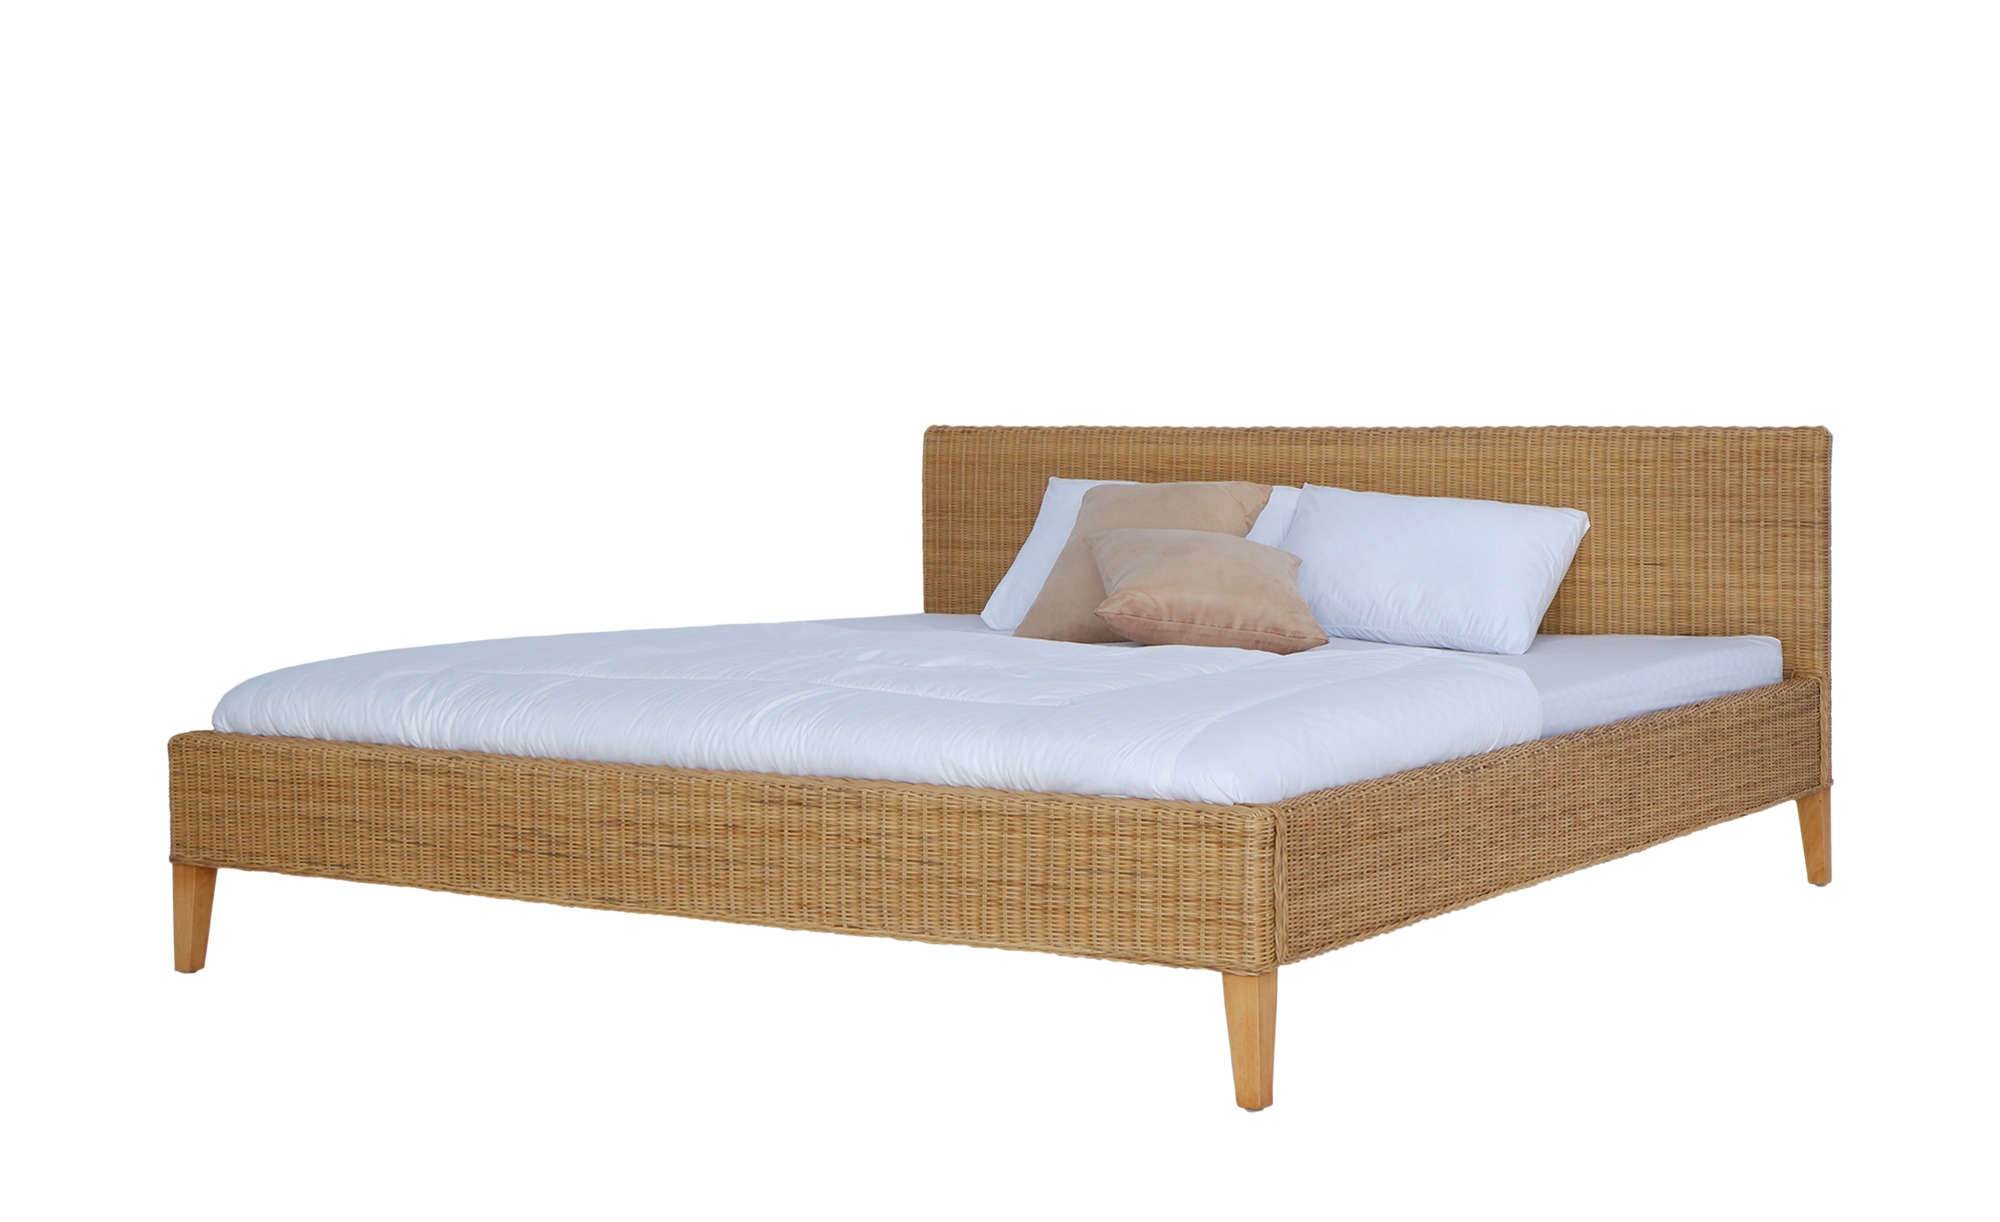 Rattan-Bettgestell - holzfarben - 192 cm - 76 cm - 210 cm - Betten > Bettgestelle - Möbel Kraft | Schlafzimmer > Betten > Rattanbetten | Sconto